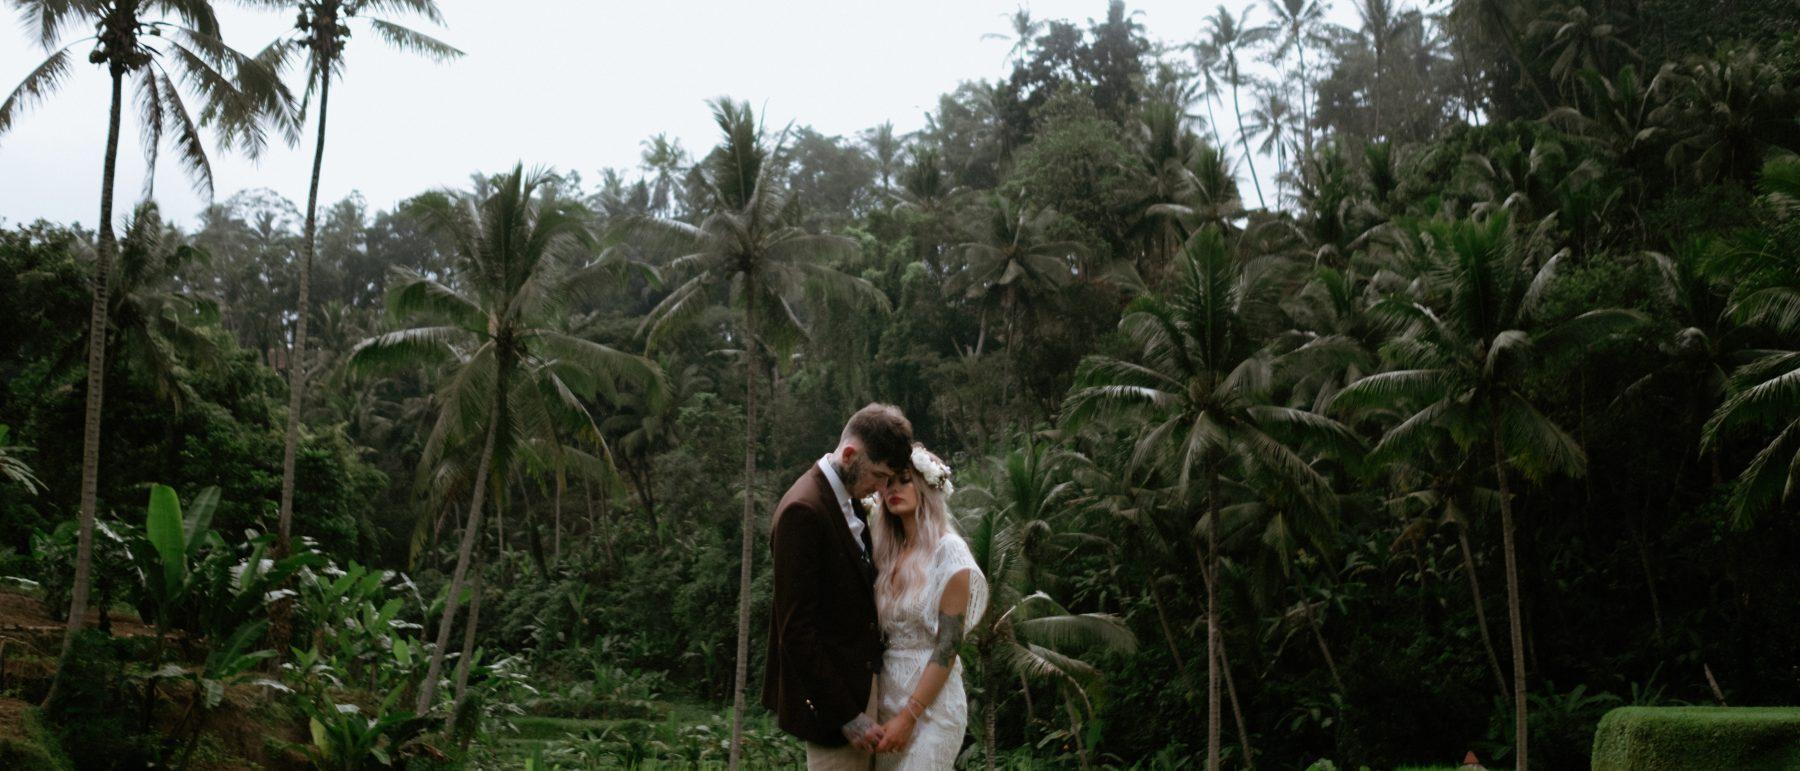 Bride and groom portrait in Ubud, Bali destination wedding photographer